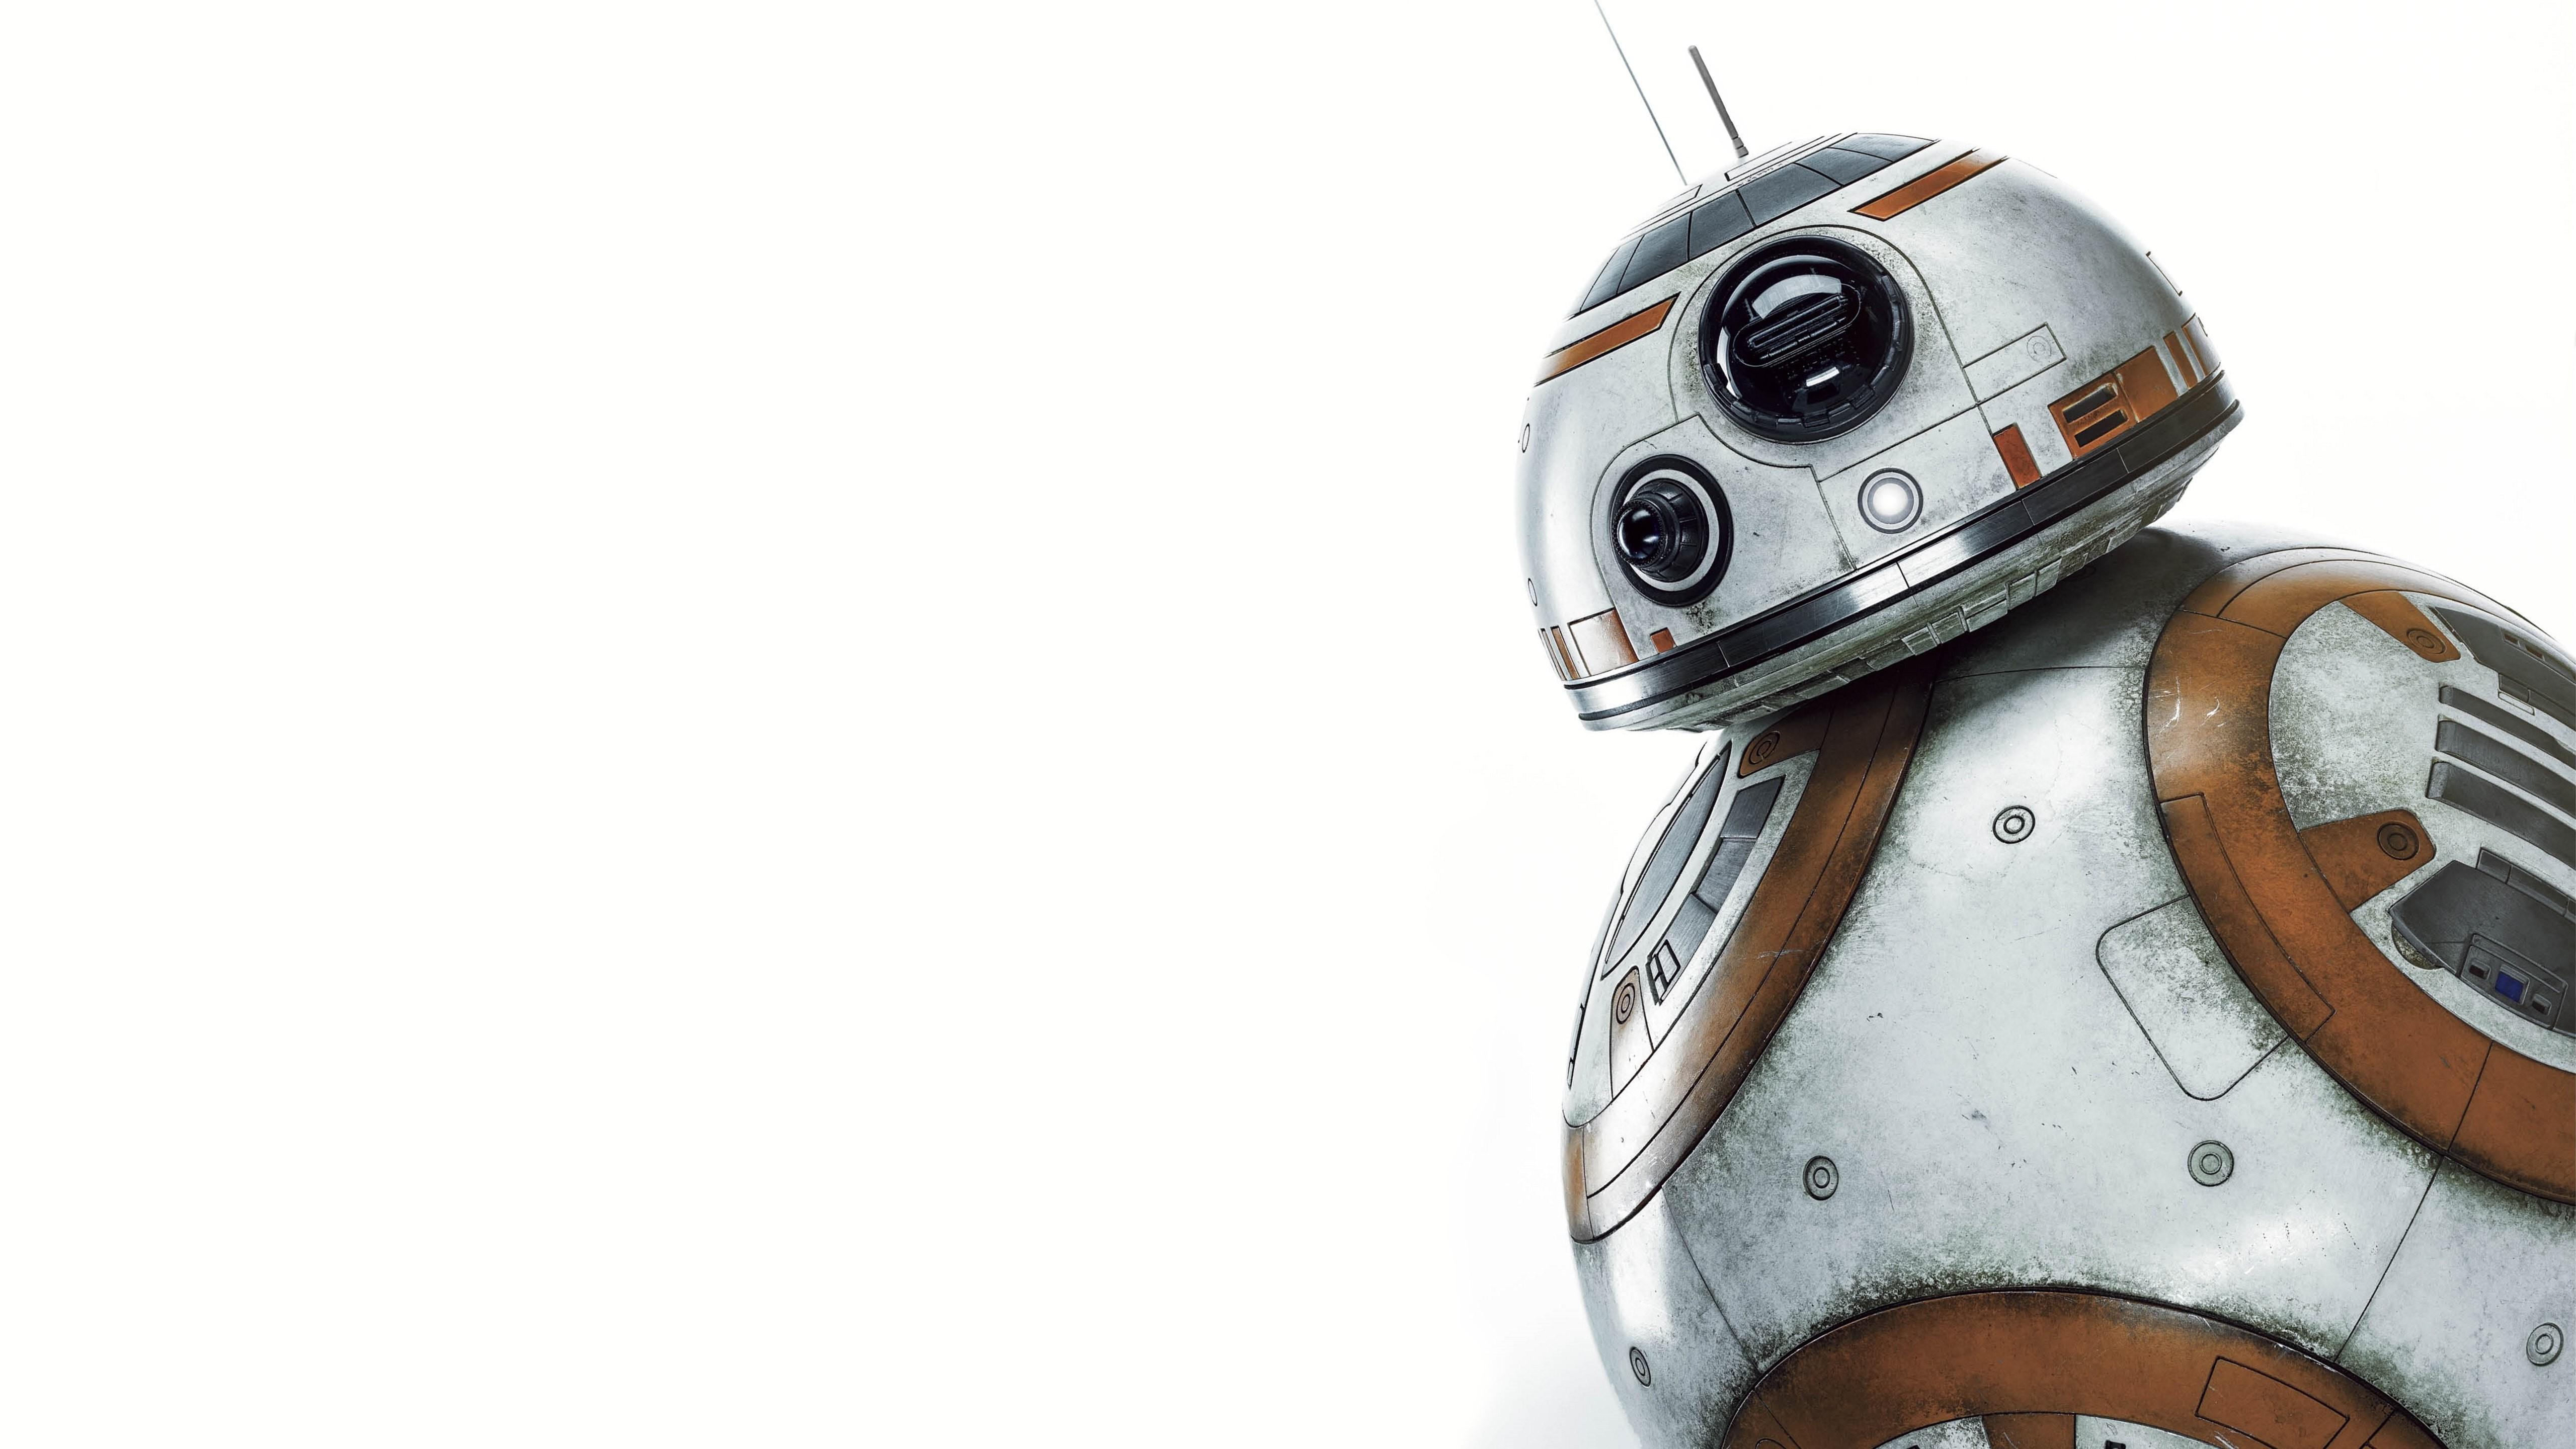 Download Wallpaper Macbook Star Wars - Star-Wars-BB-8-hand-5120x2880-px-product-631739  Photograph_248127.jpg